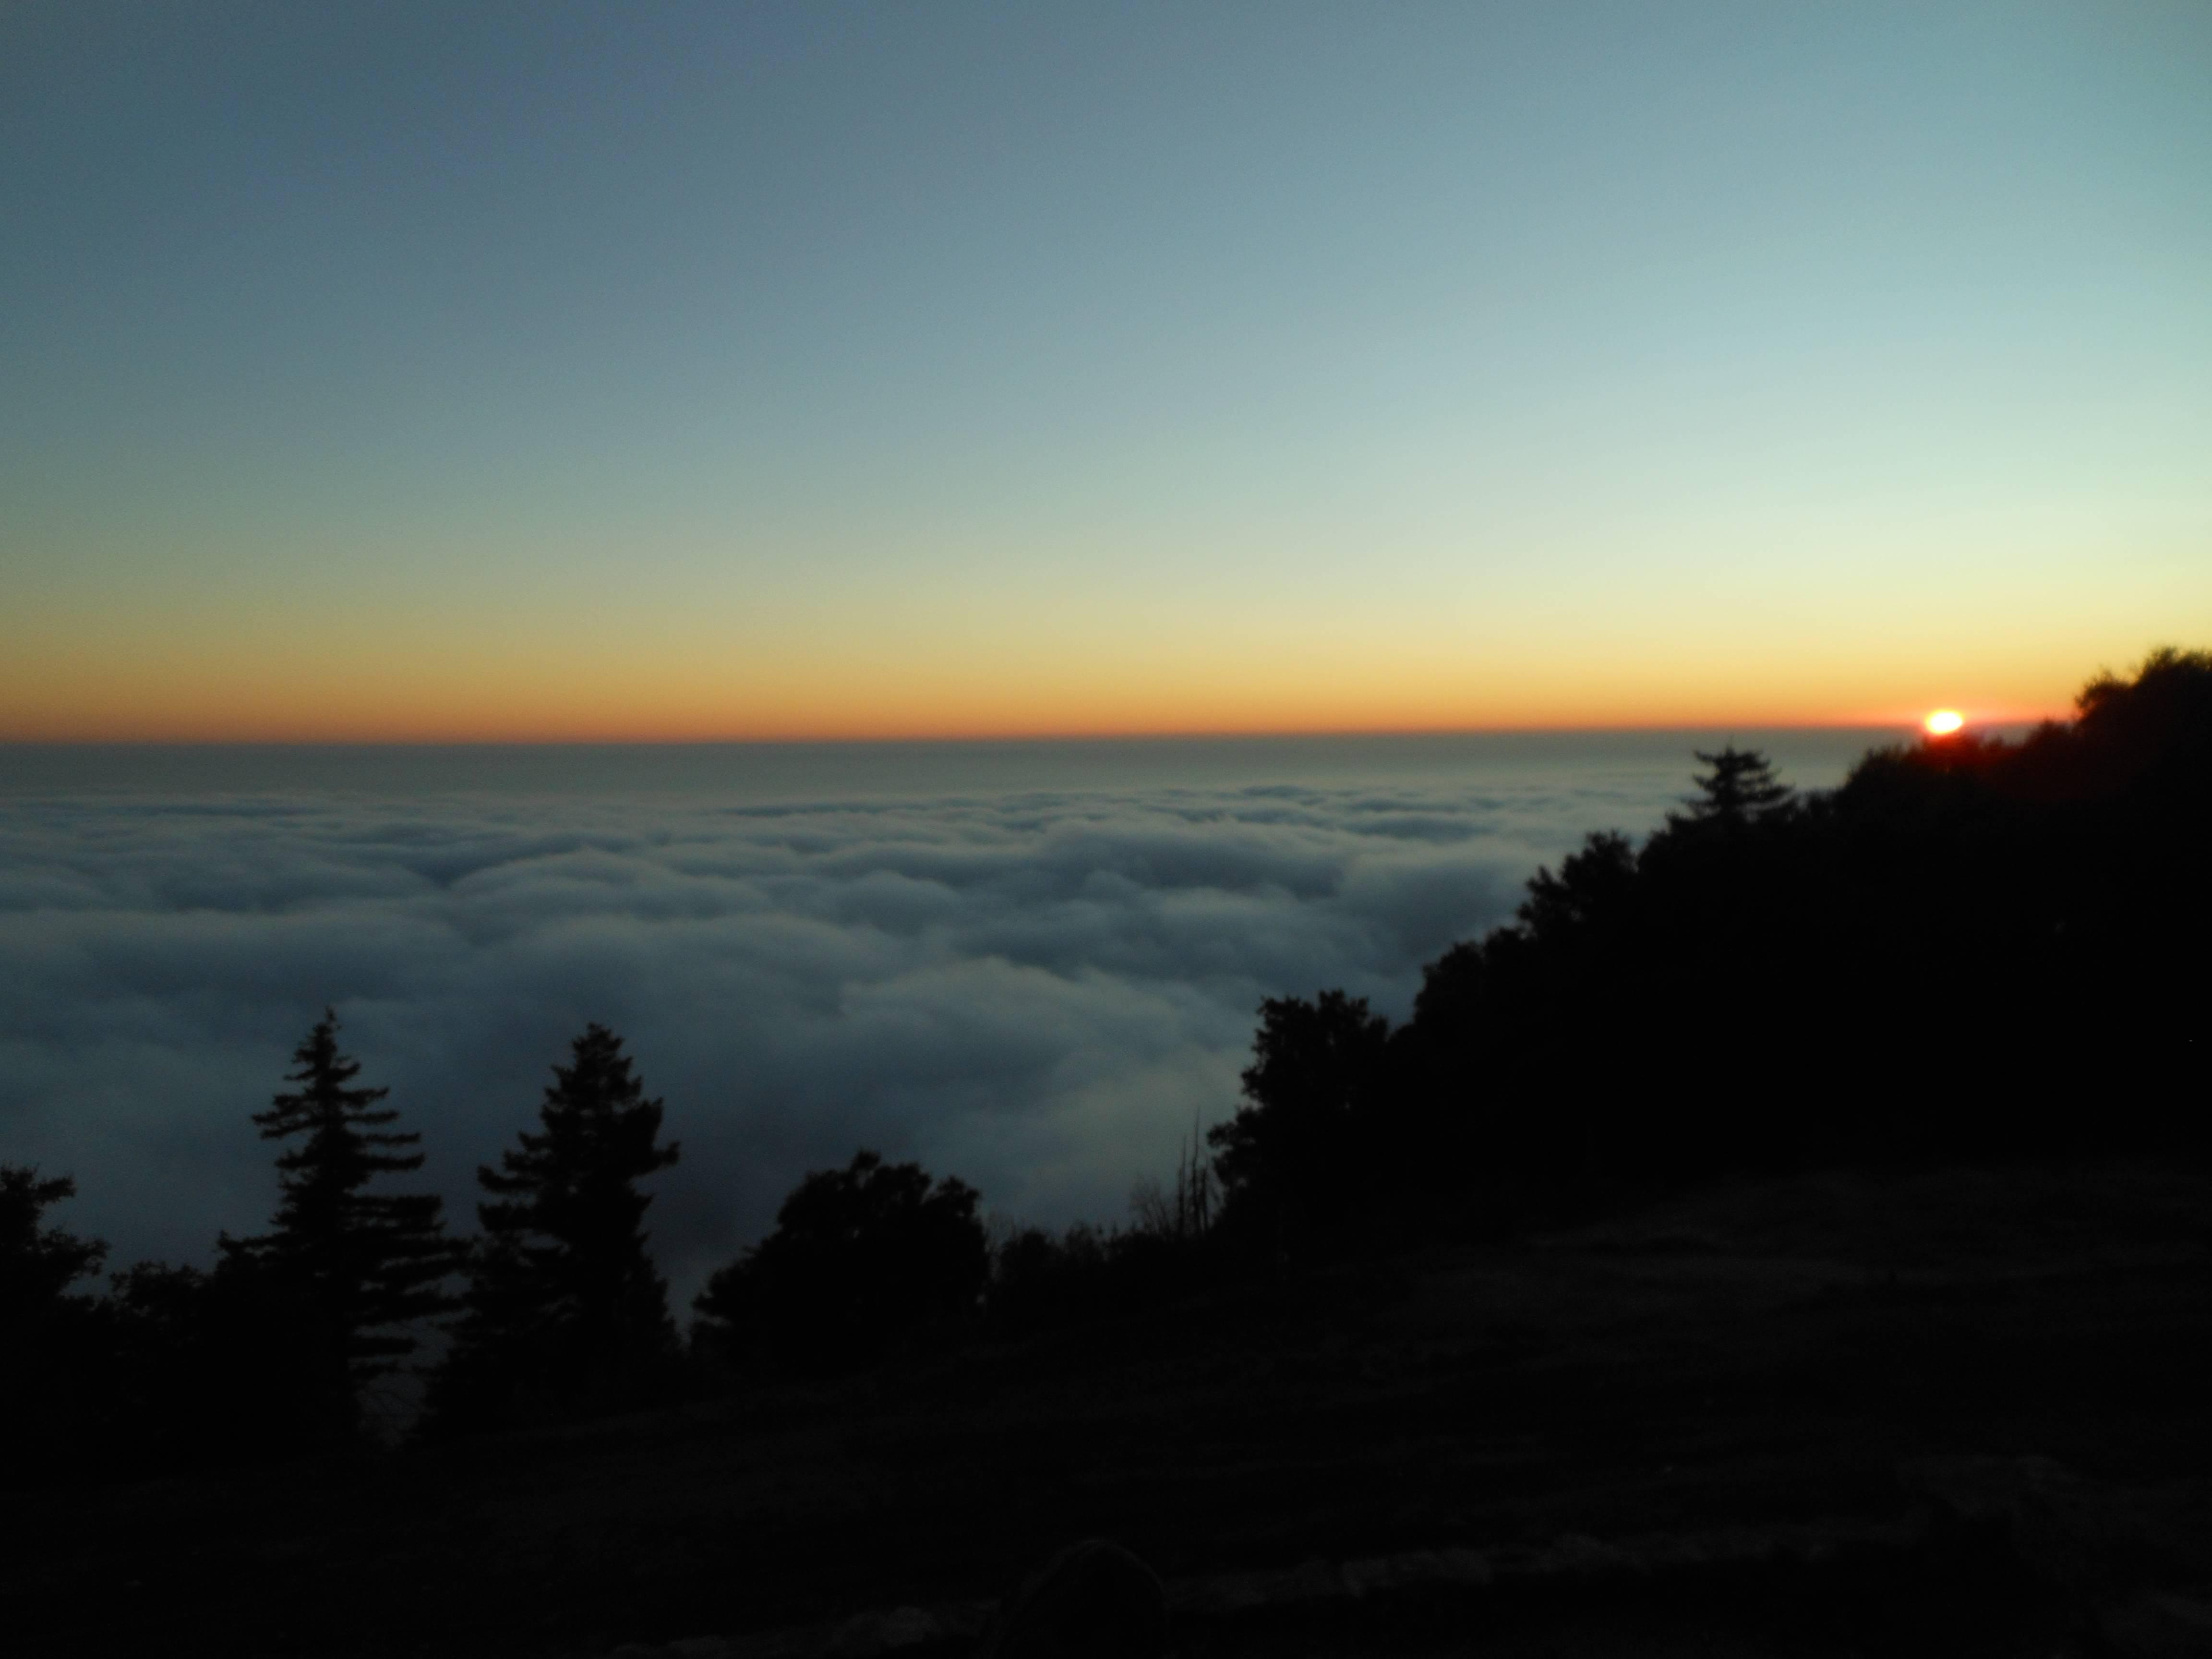 Sunset from atop Palomar mountain